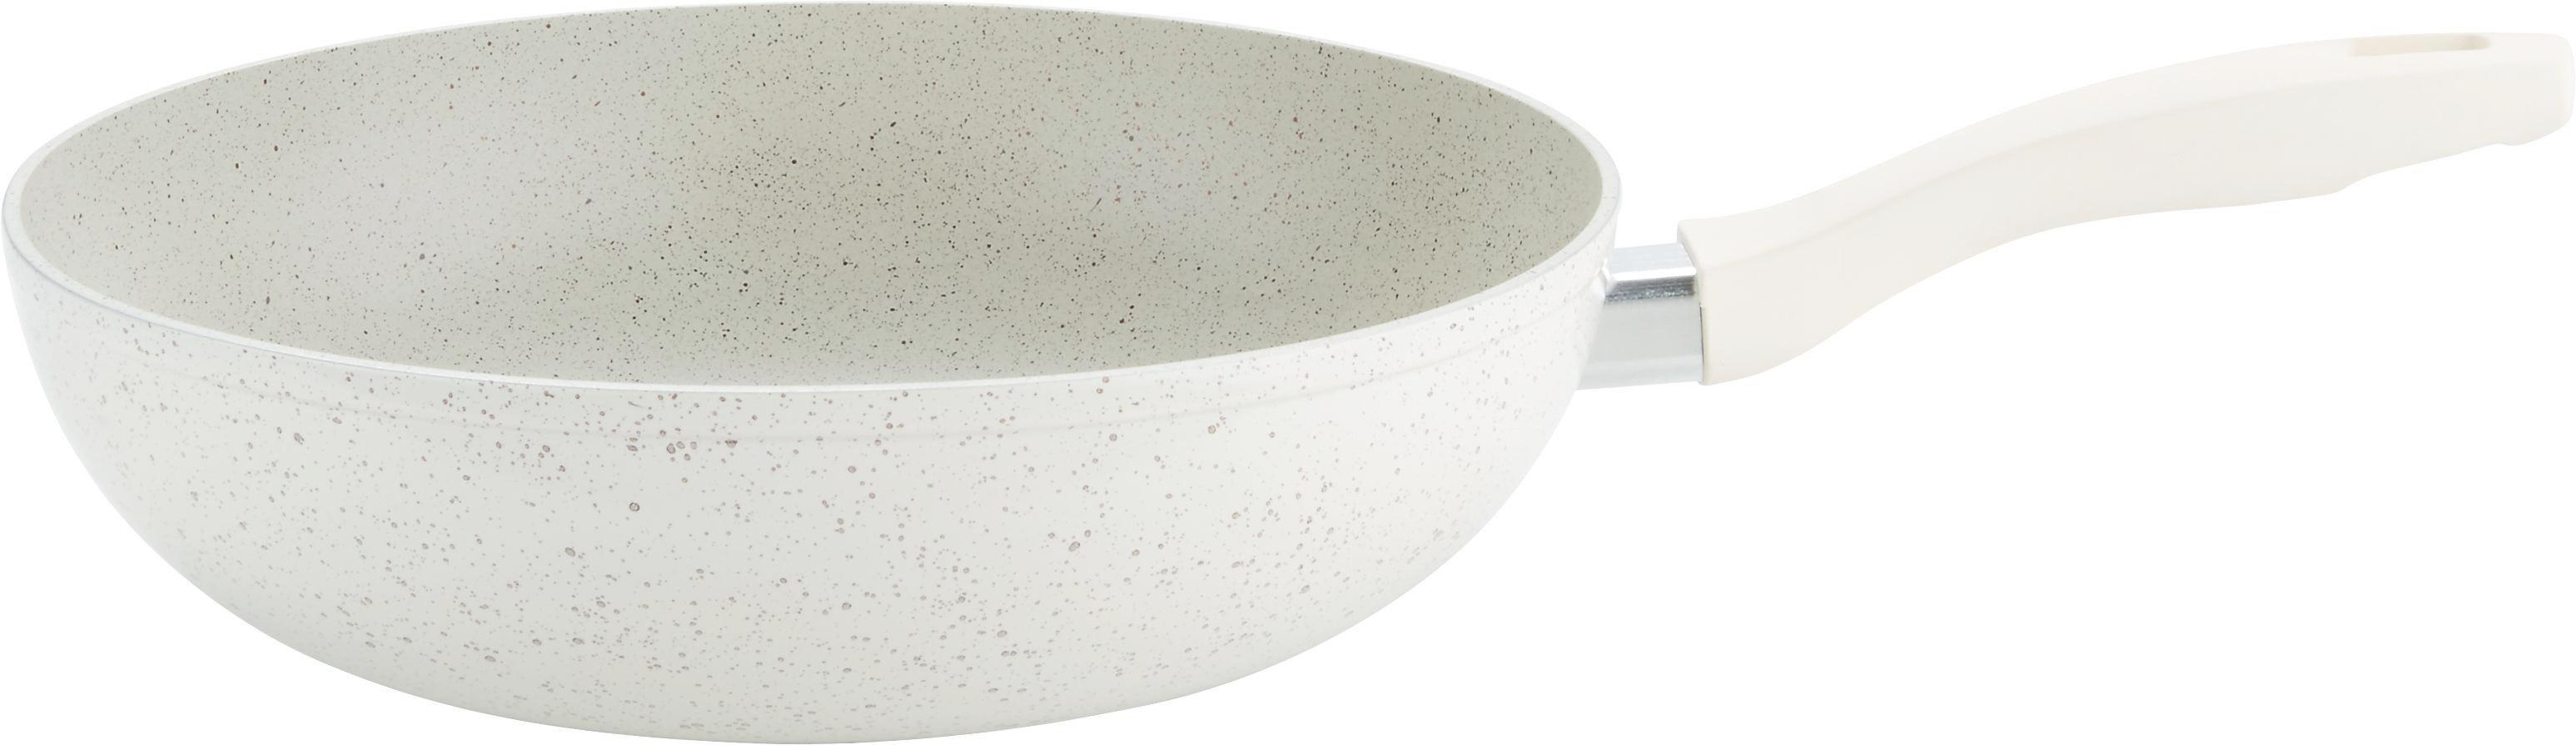 Serpenyő Marmor - krém, műanyag/fém (28/8cm) - premium living